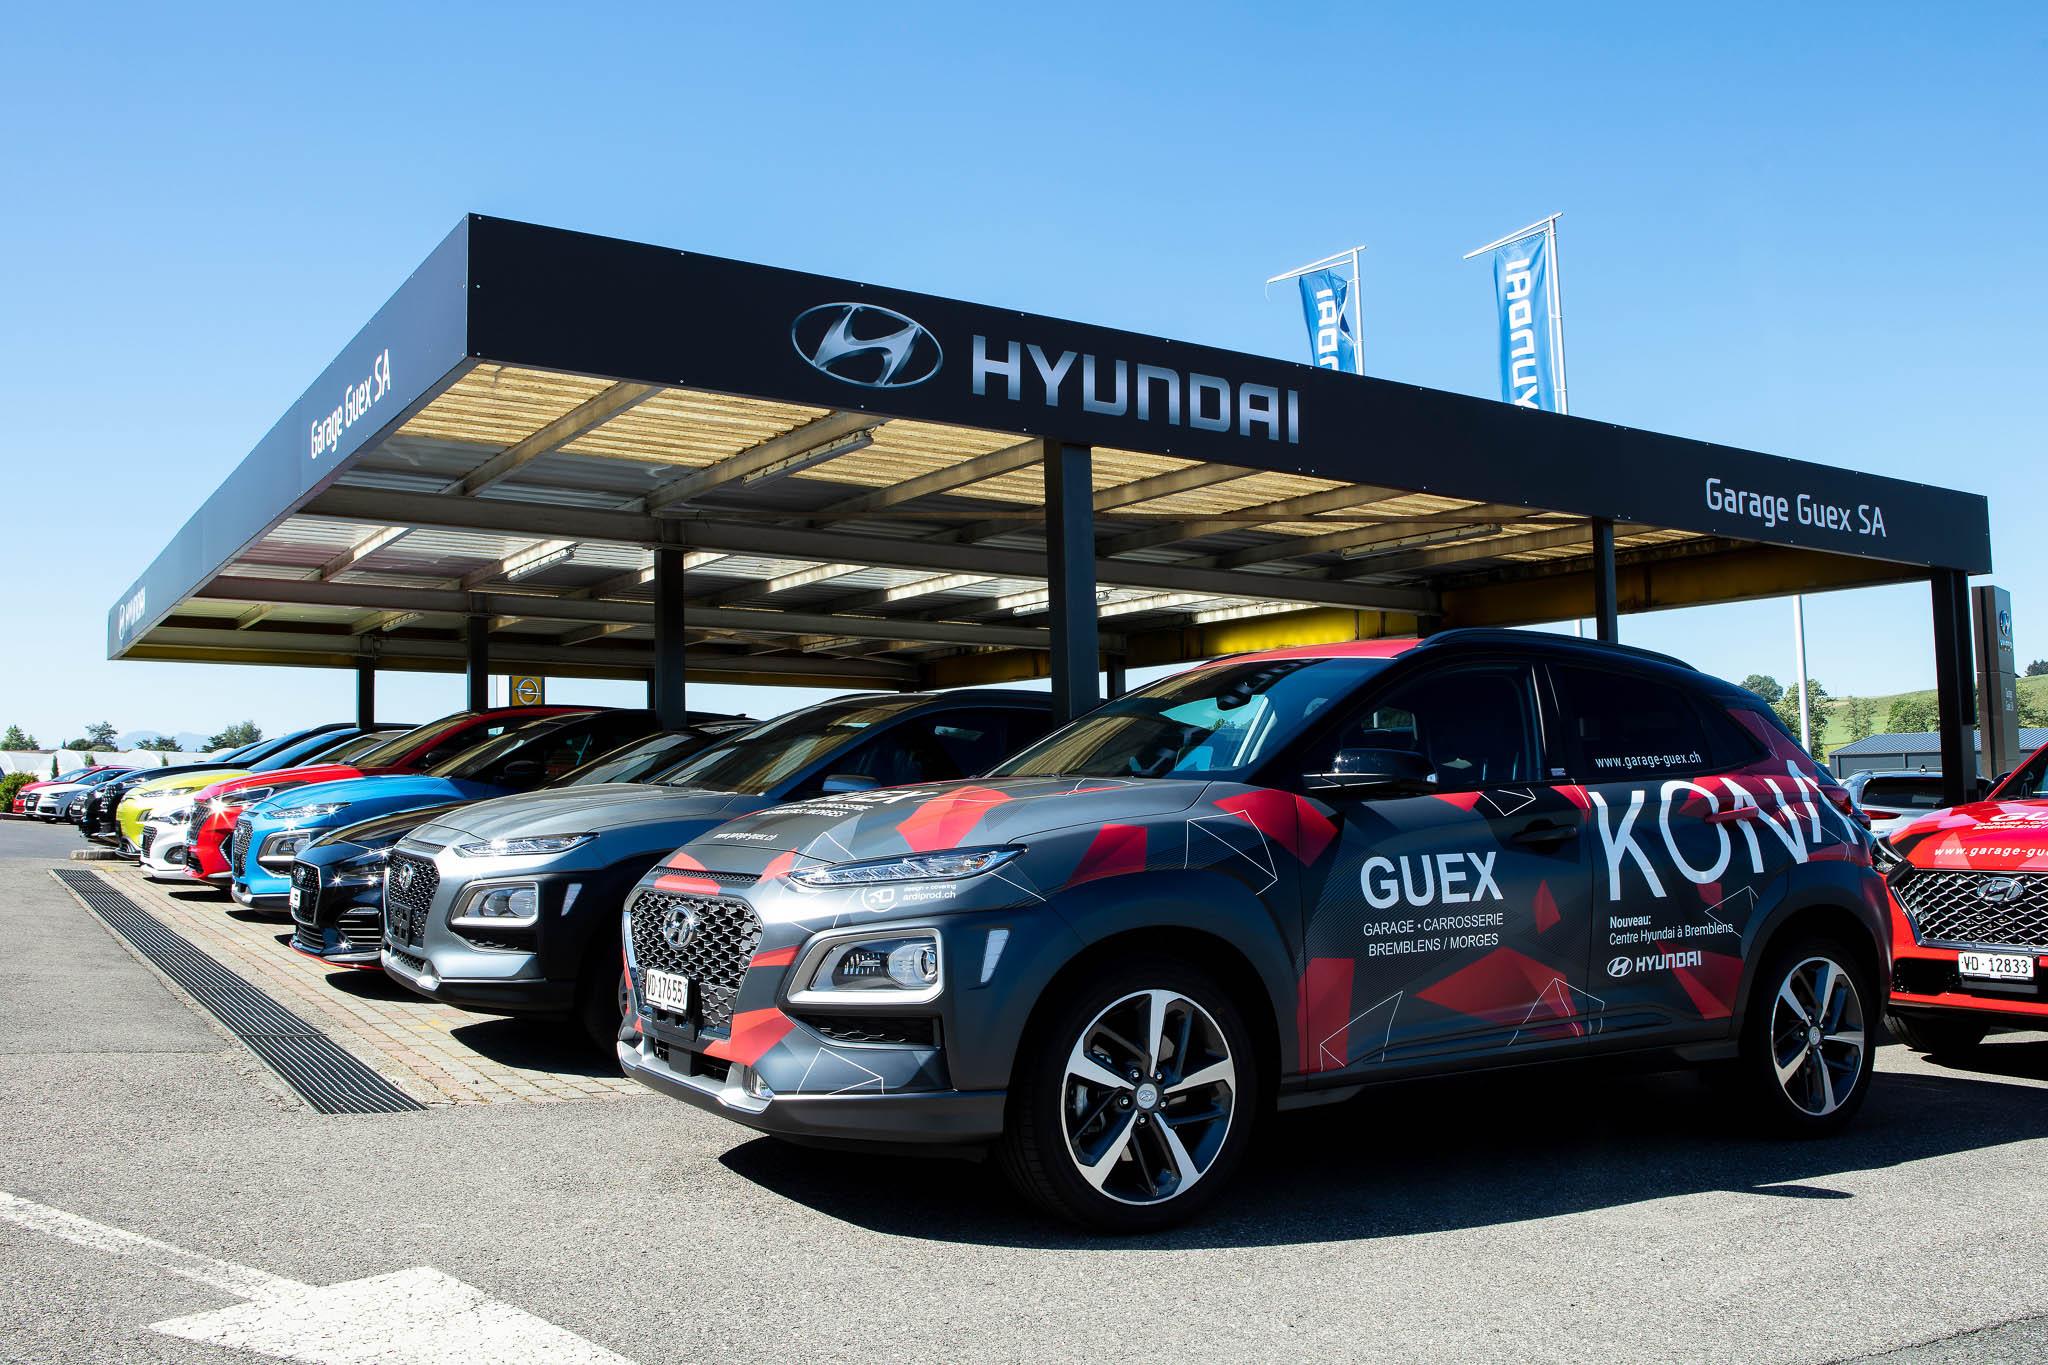 Hyundai Garage Guex SA